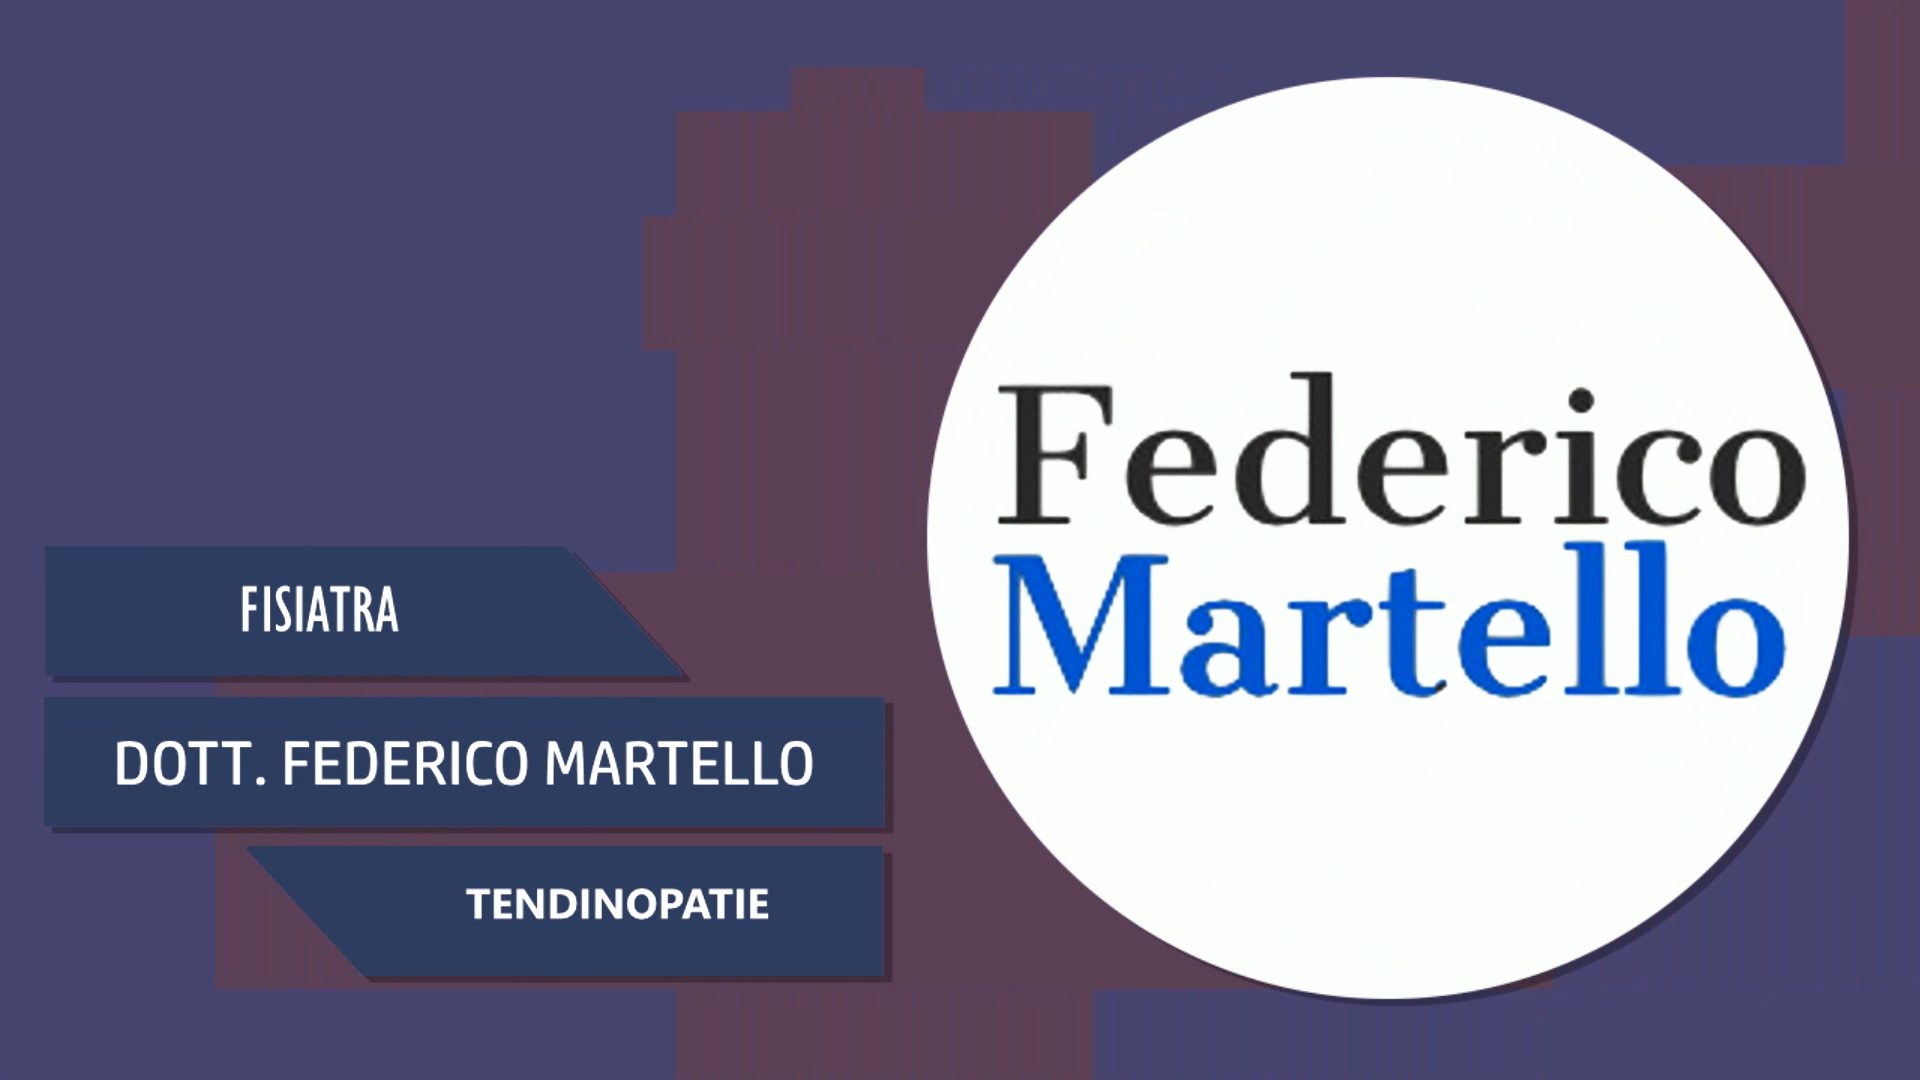 Intervista al Dott. Federico Martello – Tendinopatie